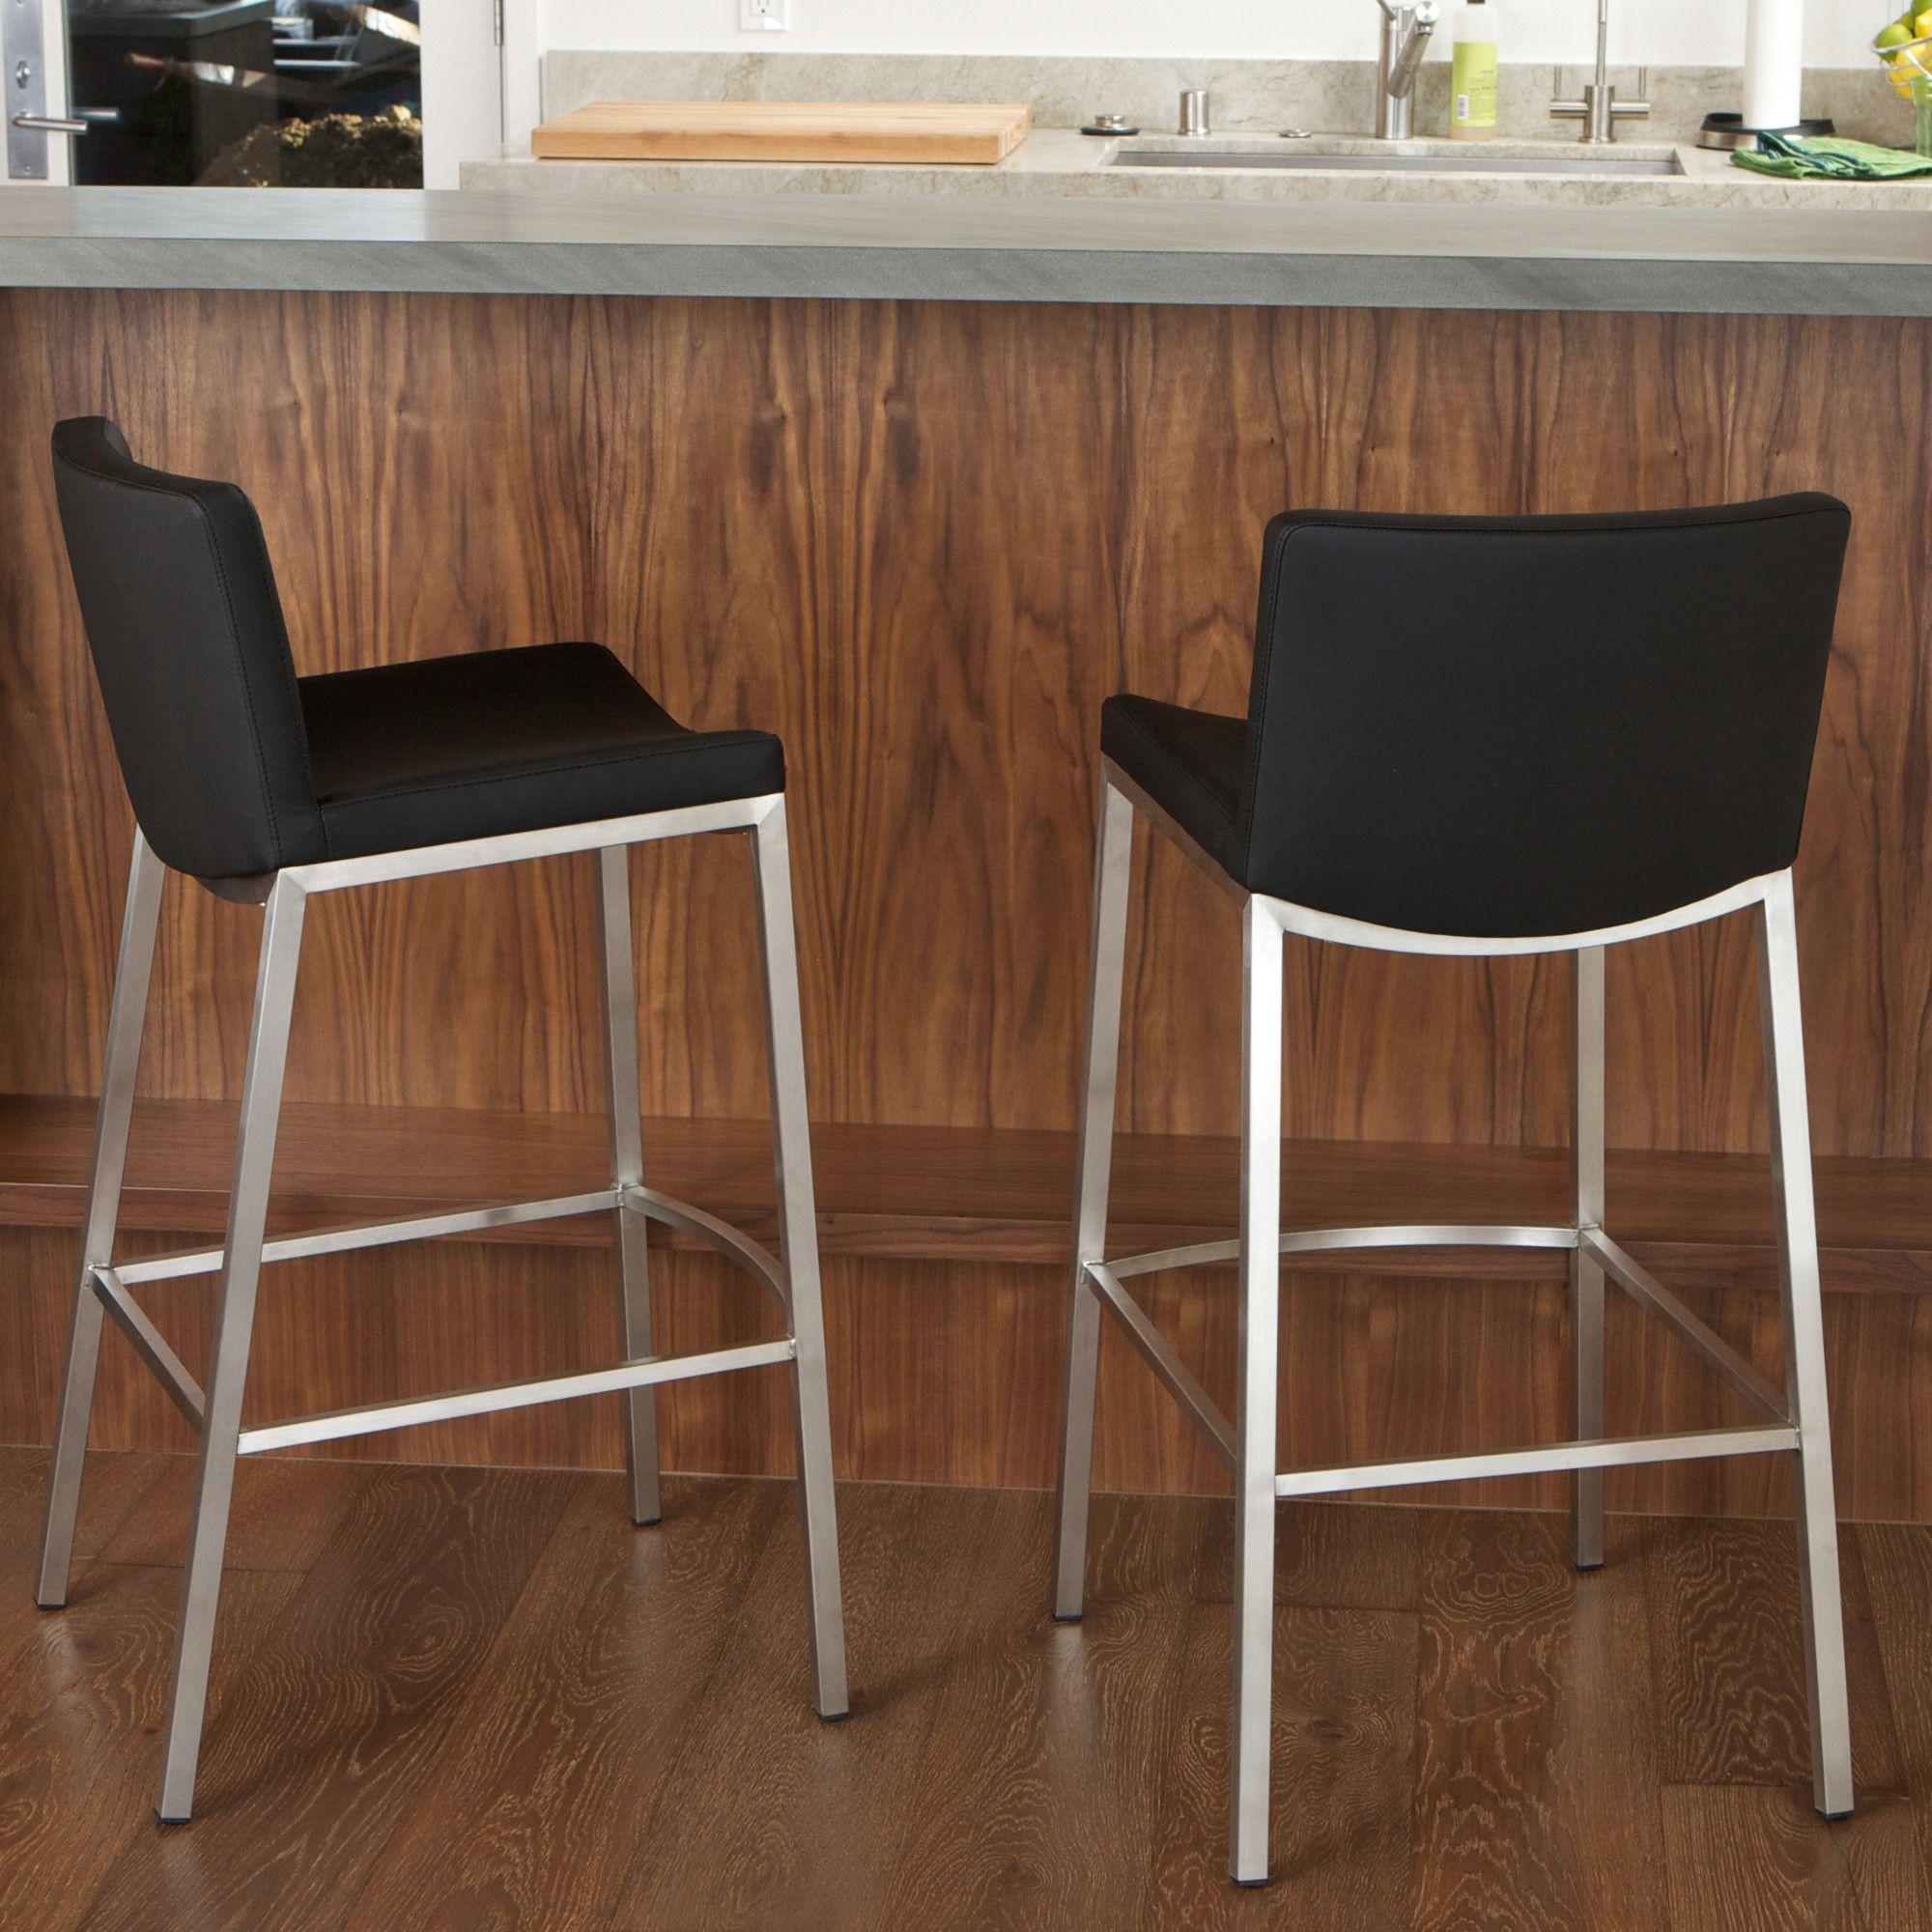 24 5 Bar Stool Products Black Bar Stools Home Bar Furniture